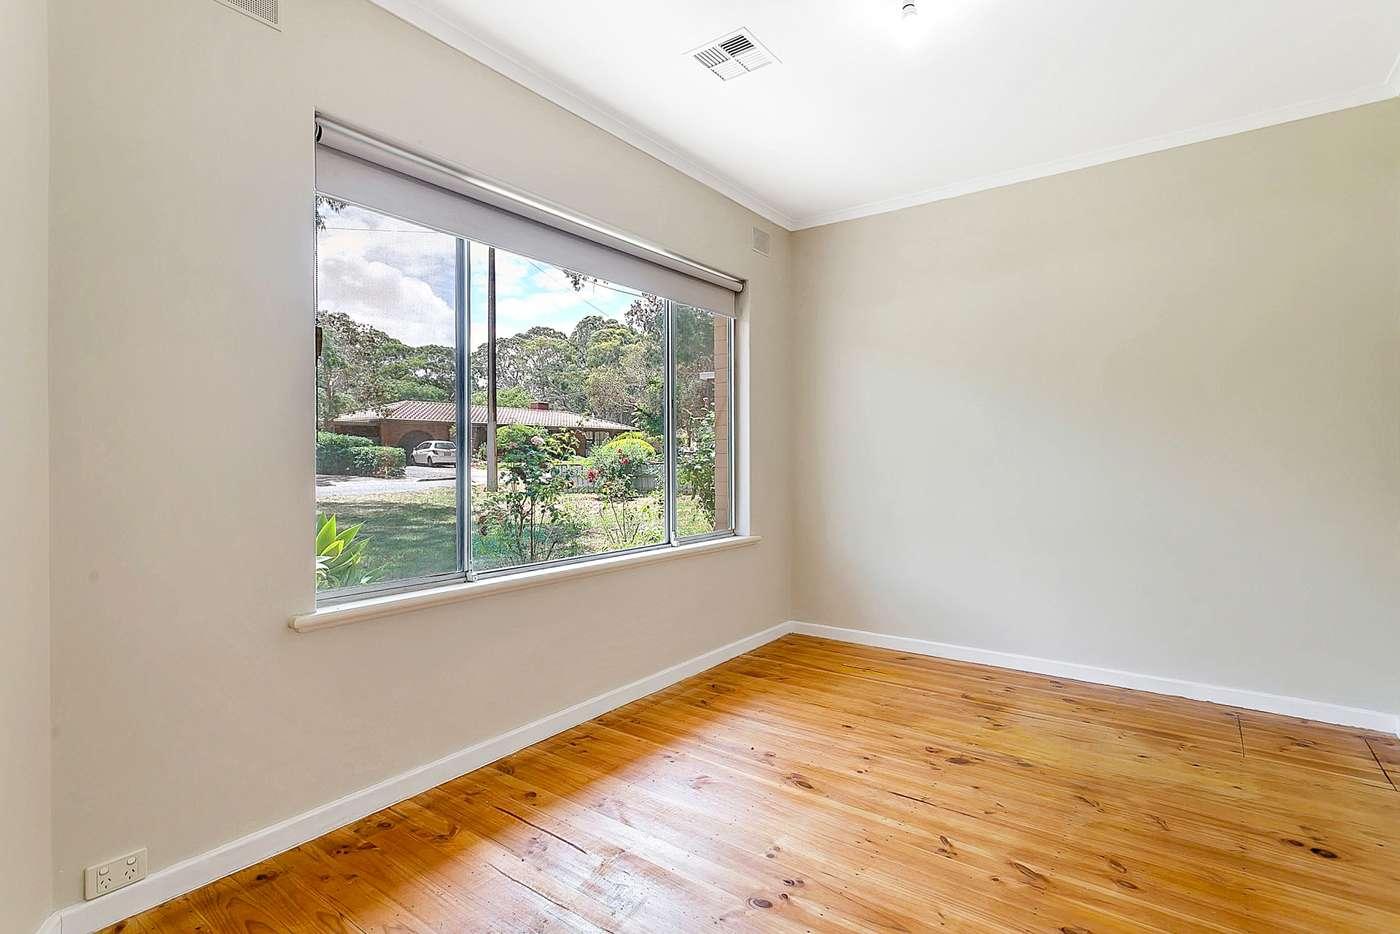 Sixth view of Homely house listing, 30 YELDHAM DRIVE, Morphett Vale SA 5162